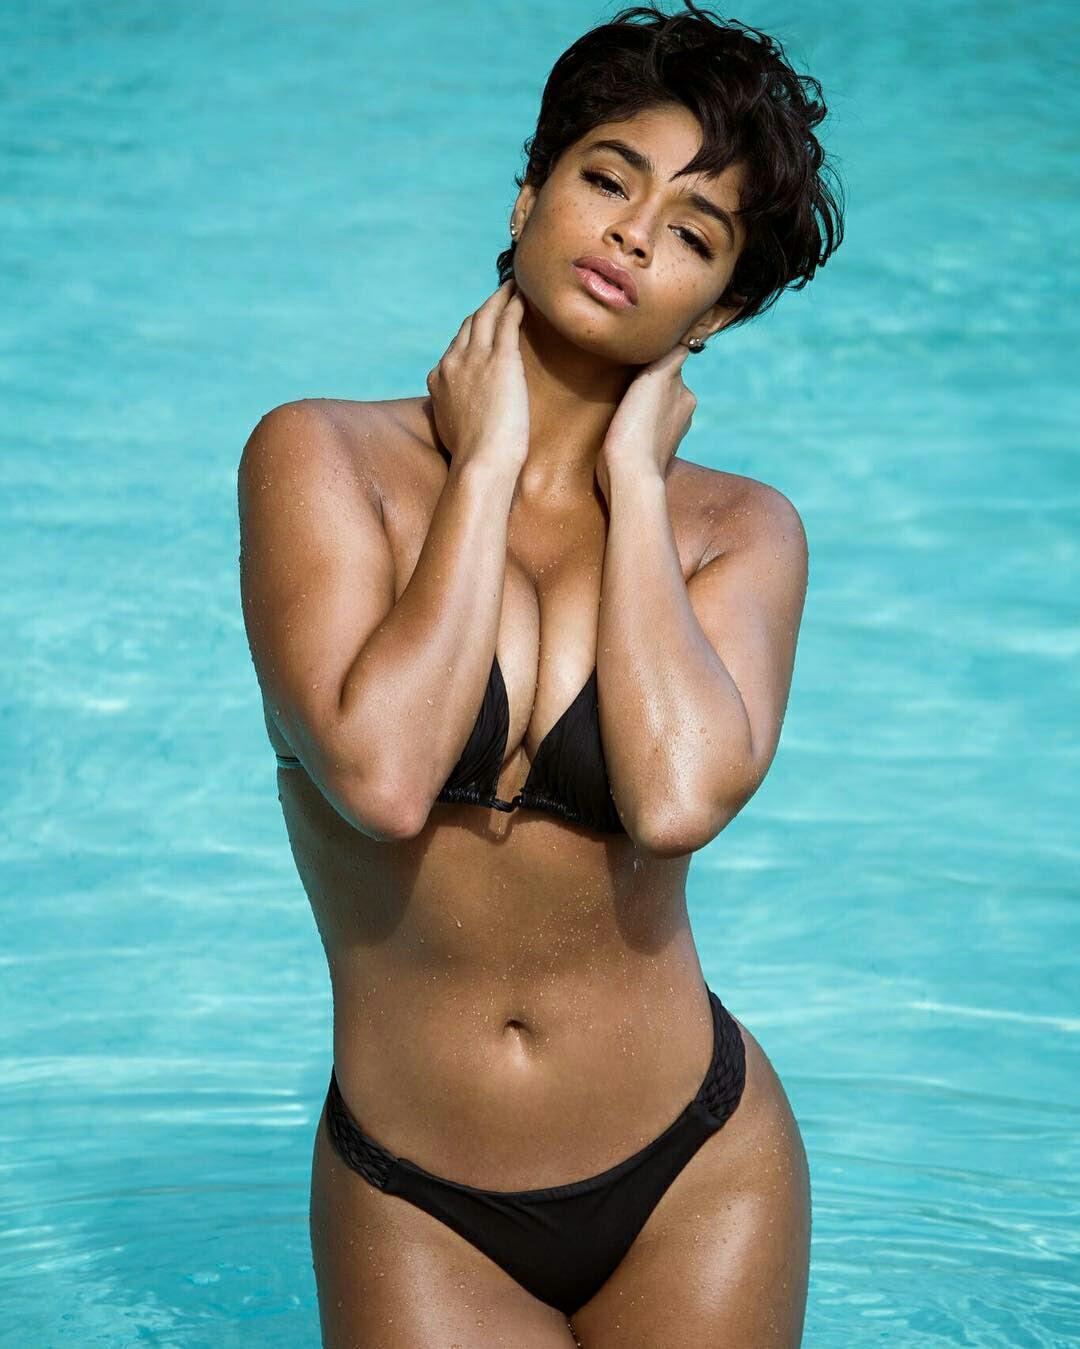 Bikini Kitrysha Bikini nude (84 photo), Pussy, Cleavage, Boobs, bra 2015